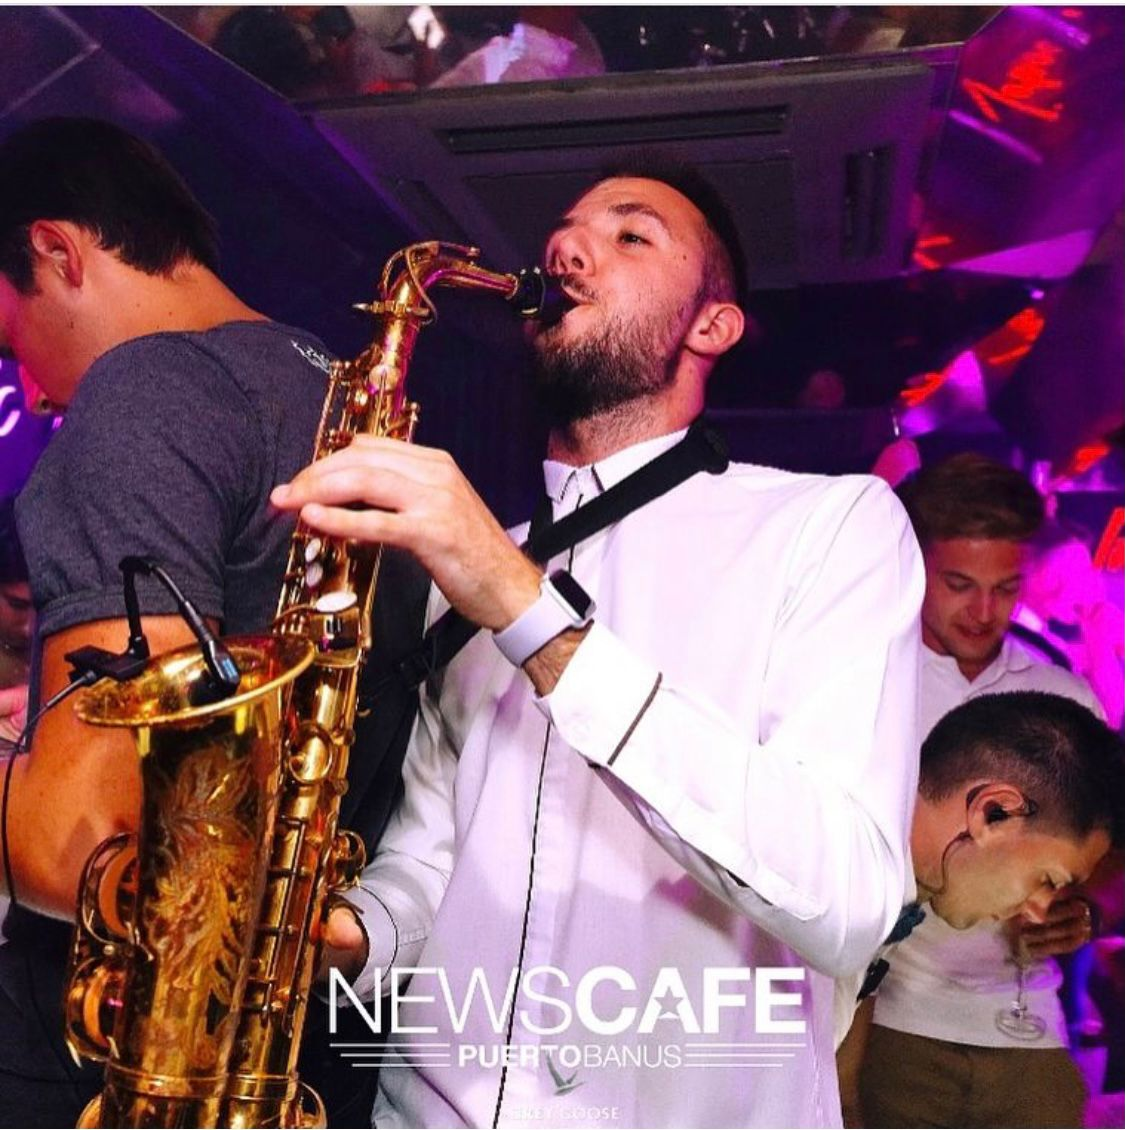 Adrian Jimenez Diaz,Wedding Saxophonist based in Malaga, Spain.